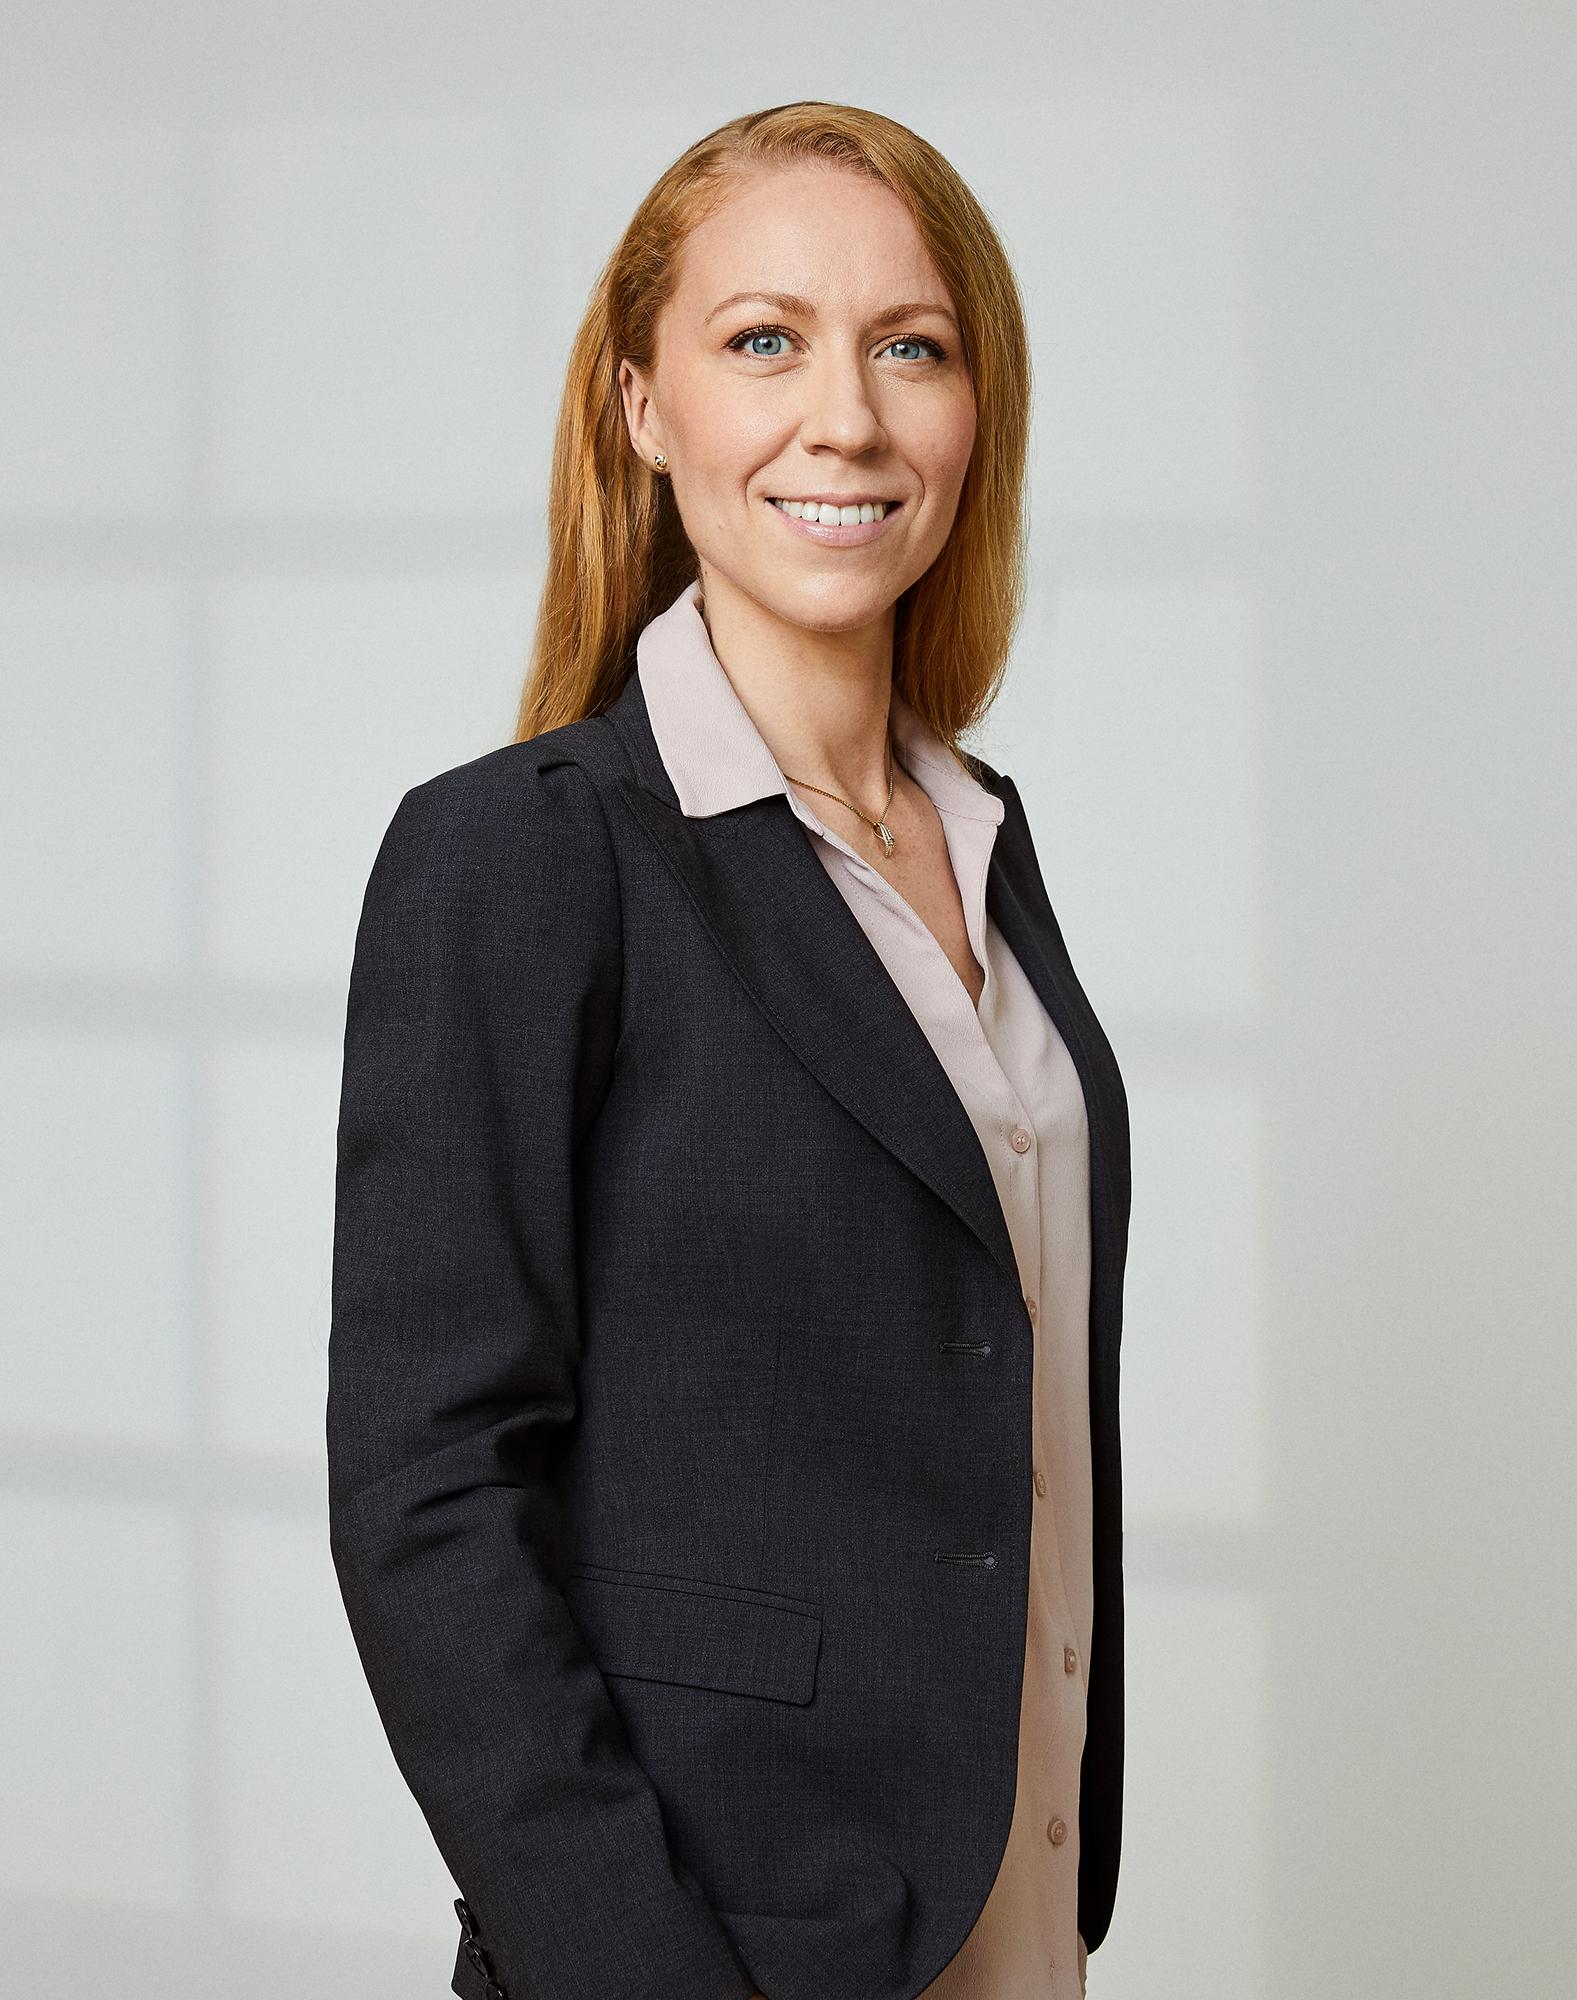 Anja Ankerud